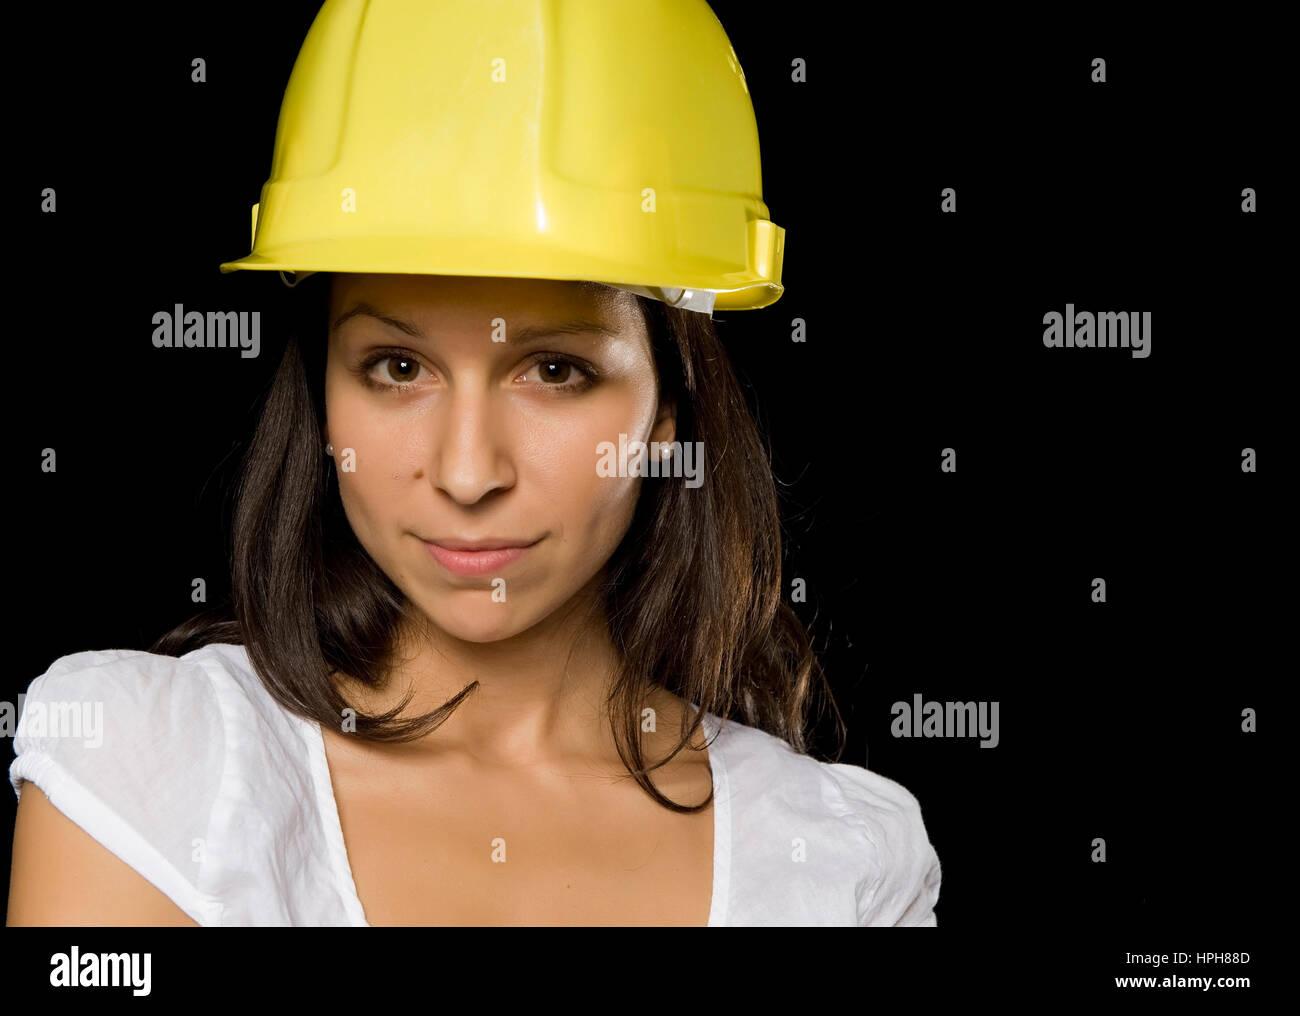 Junge Frau mit Bauarbeiterhelm - young woman with work helmet, Model released Stock Photo